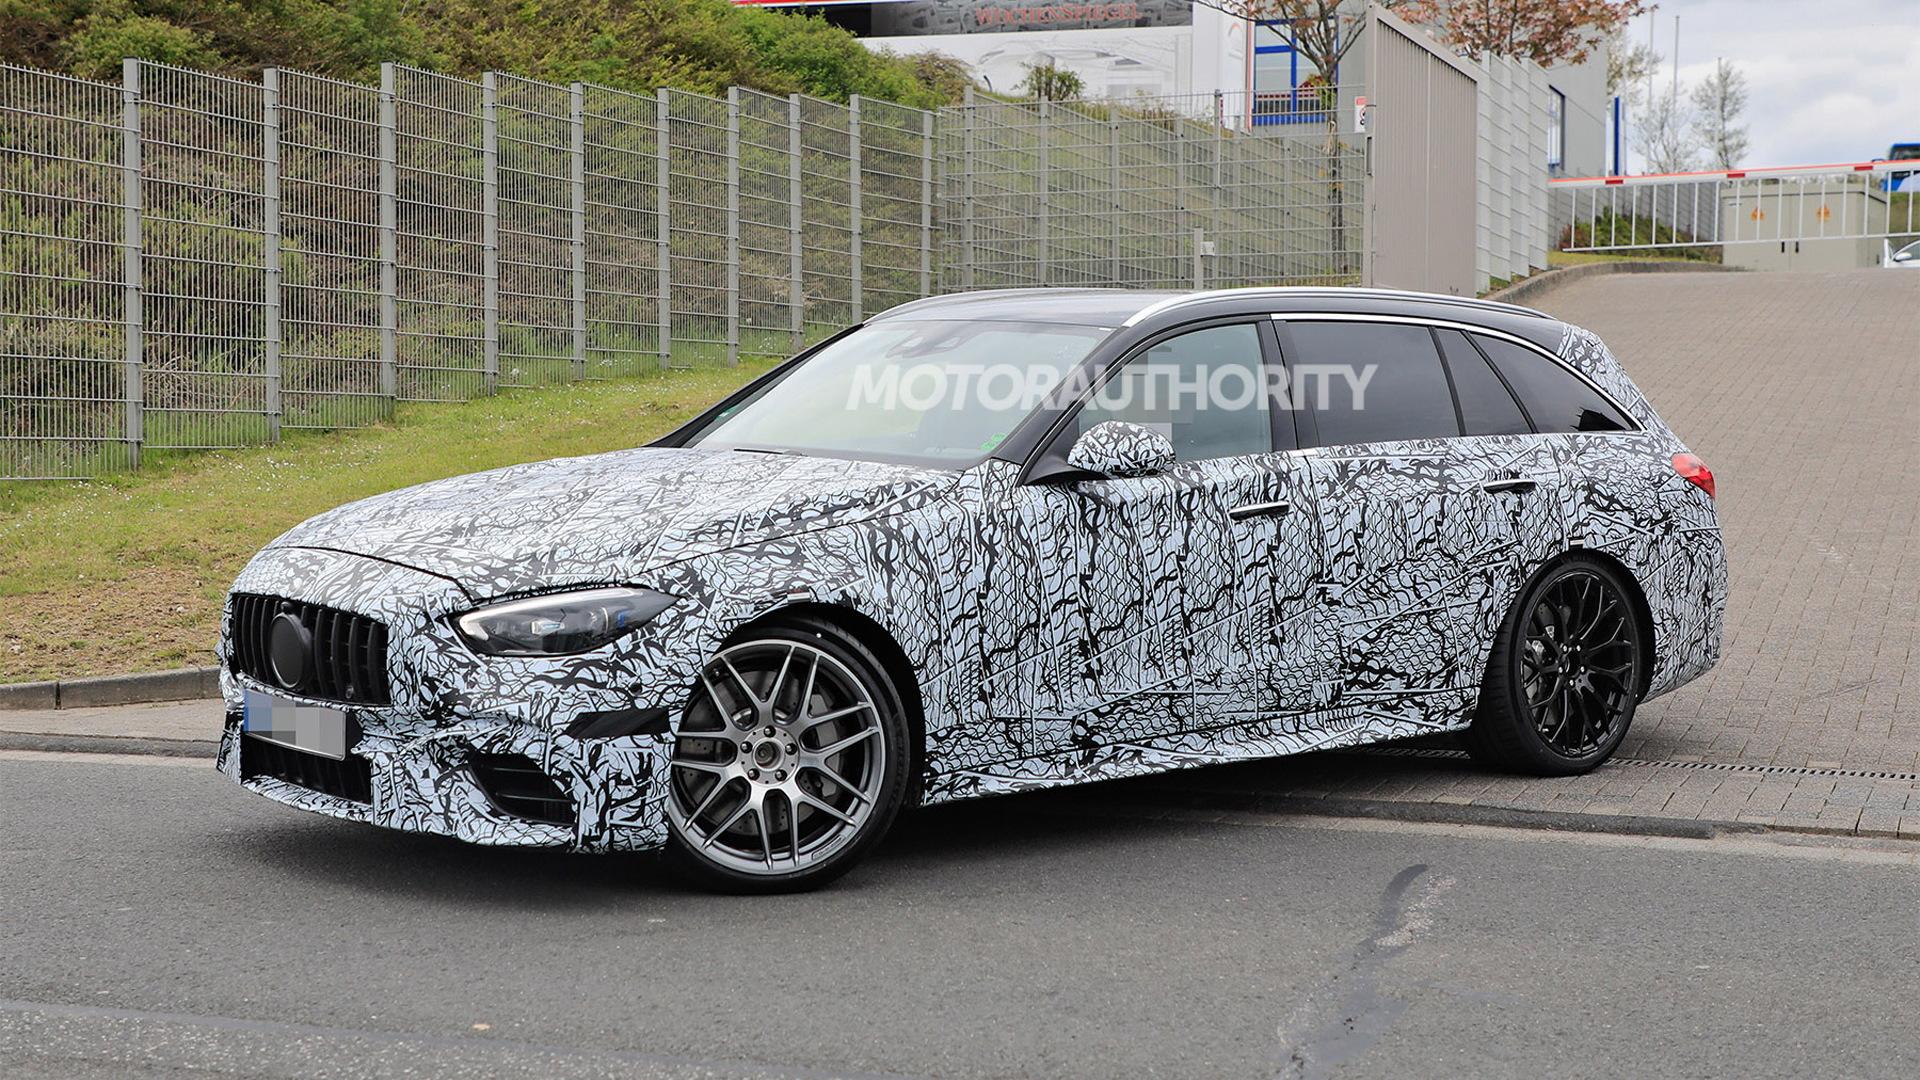 2023 Mercedes-Benz AMG C63 Wagon spy shots - Photo credit:S. Baldauf/SB-Medien